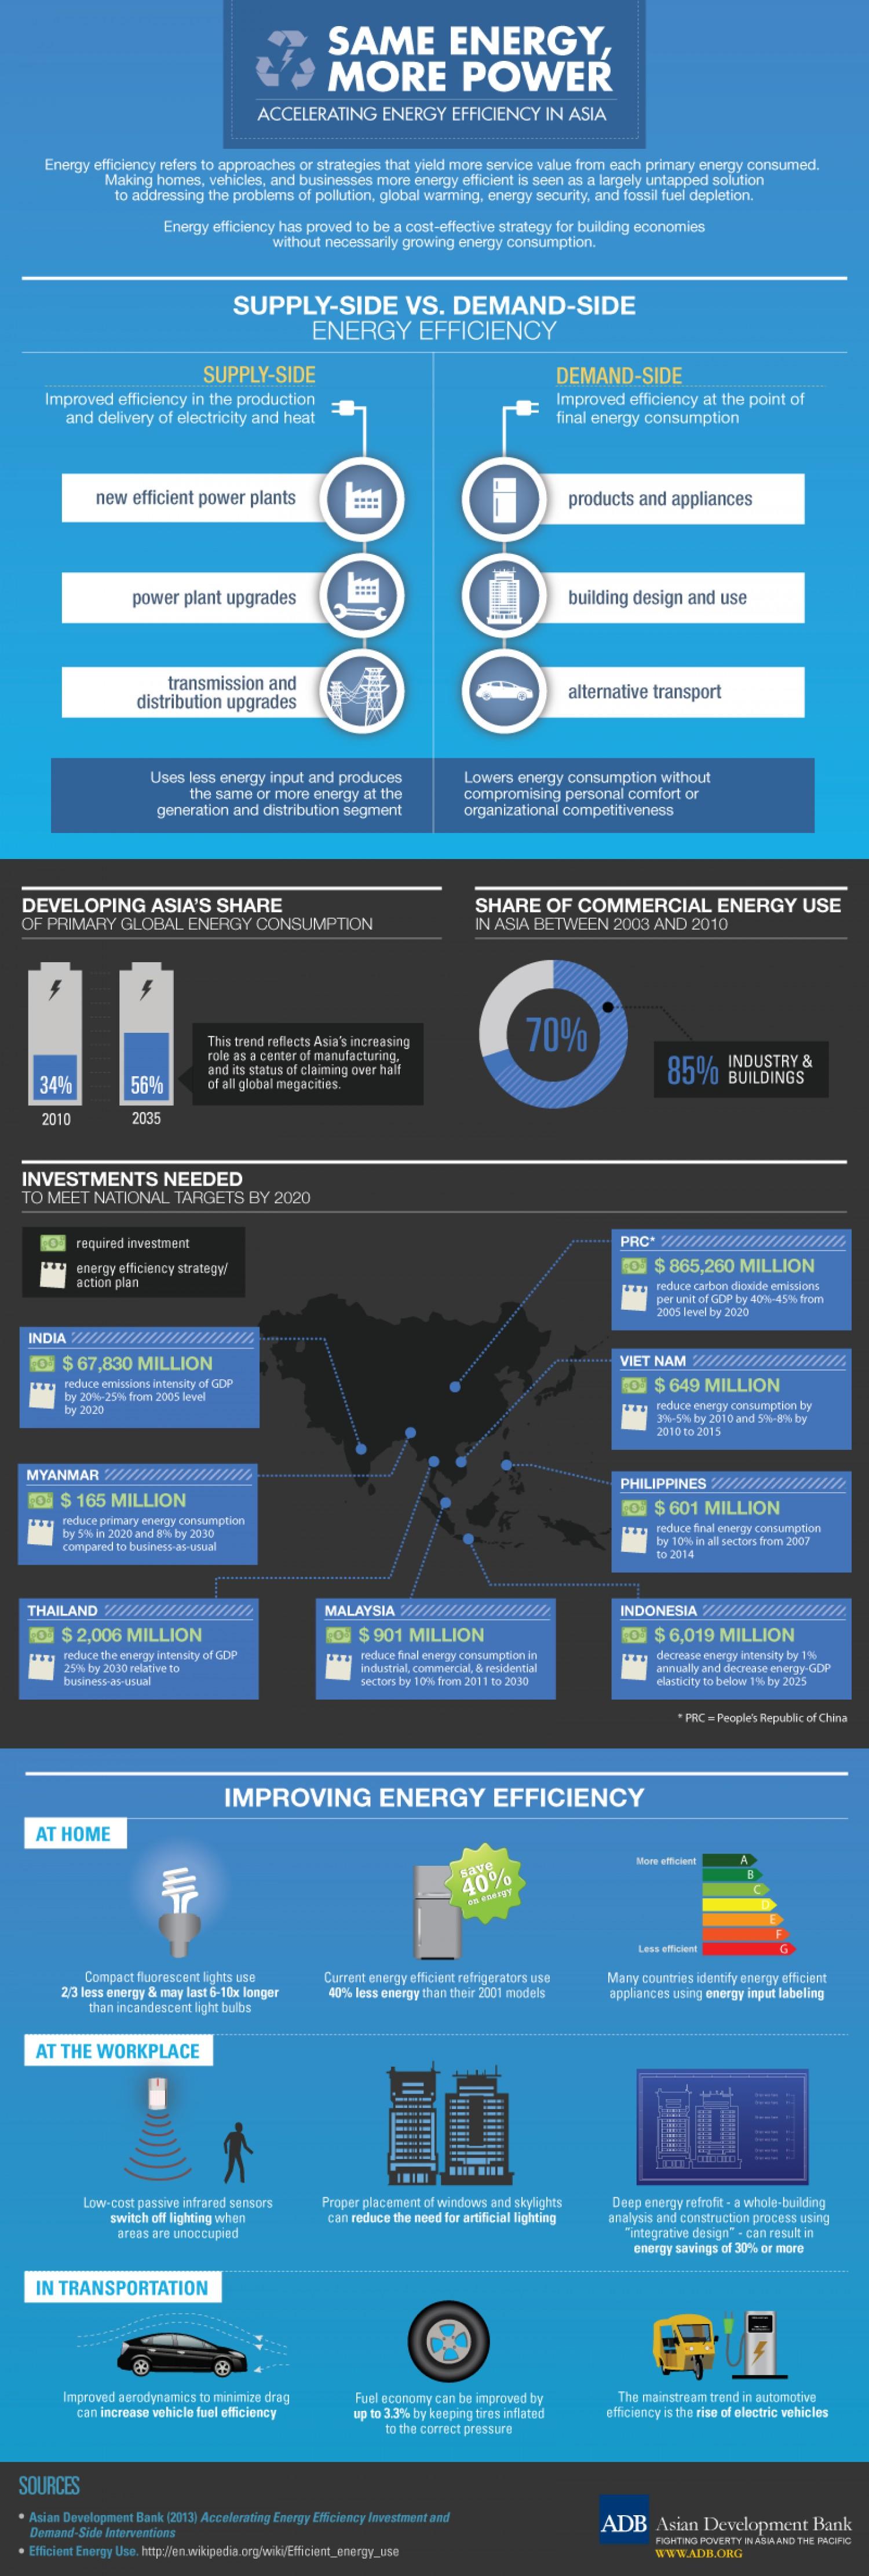 Accelerating energy efficiency in Asia